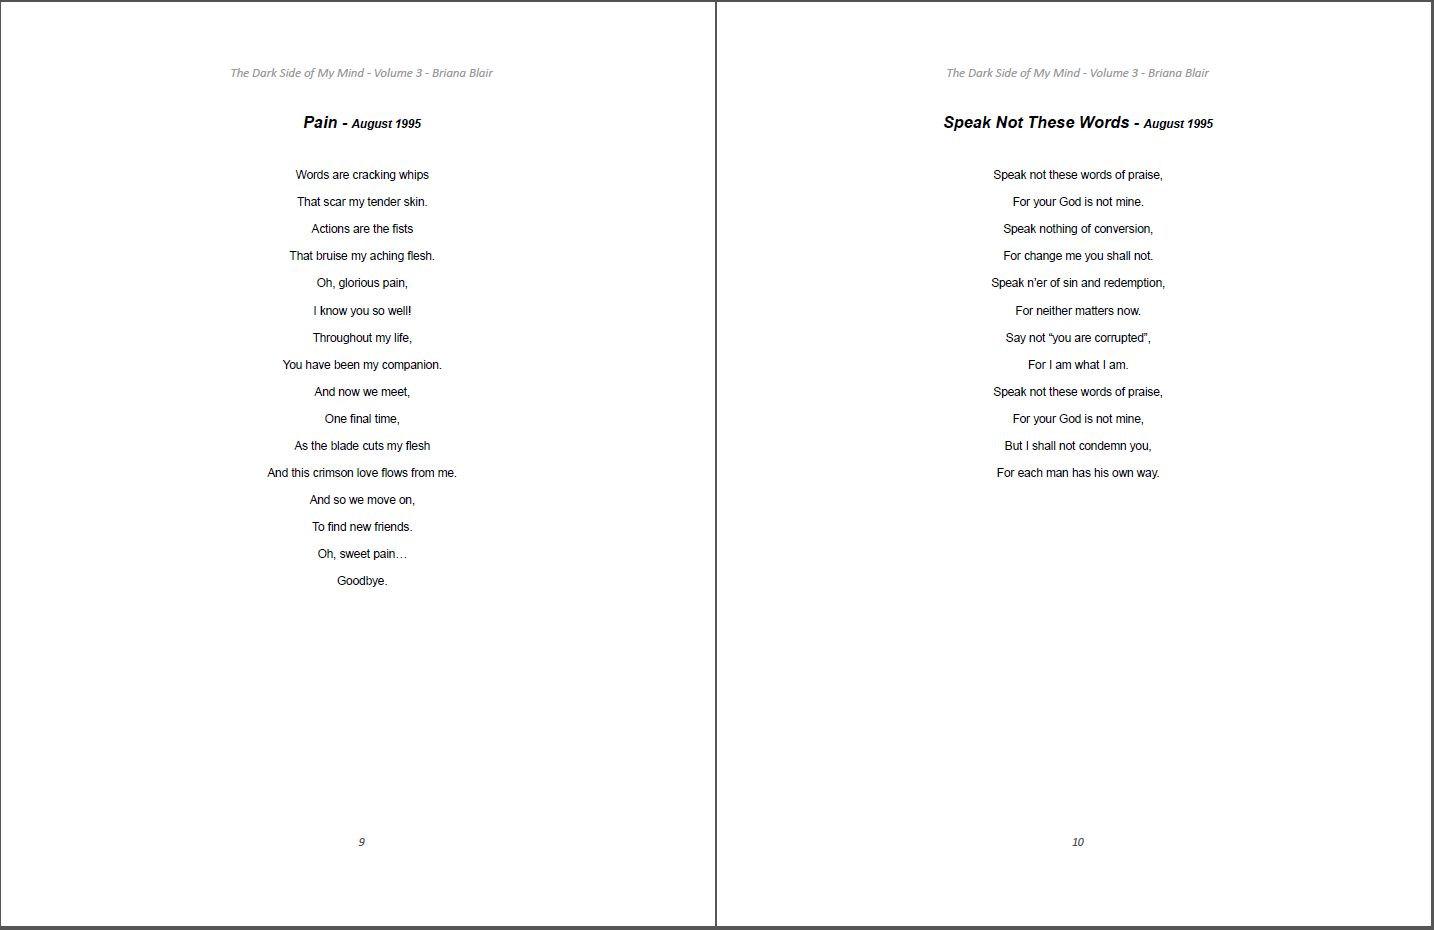 The Dark Side of My Mind – Volume 3 By Briana Blair – Poetry